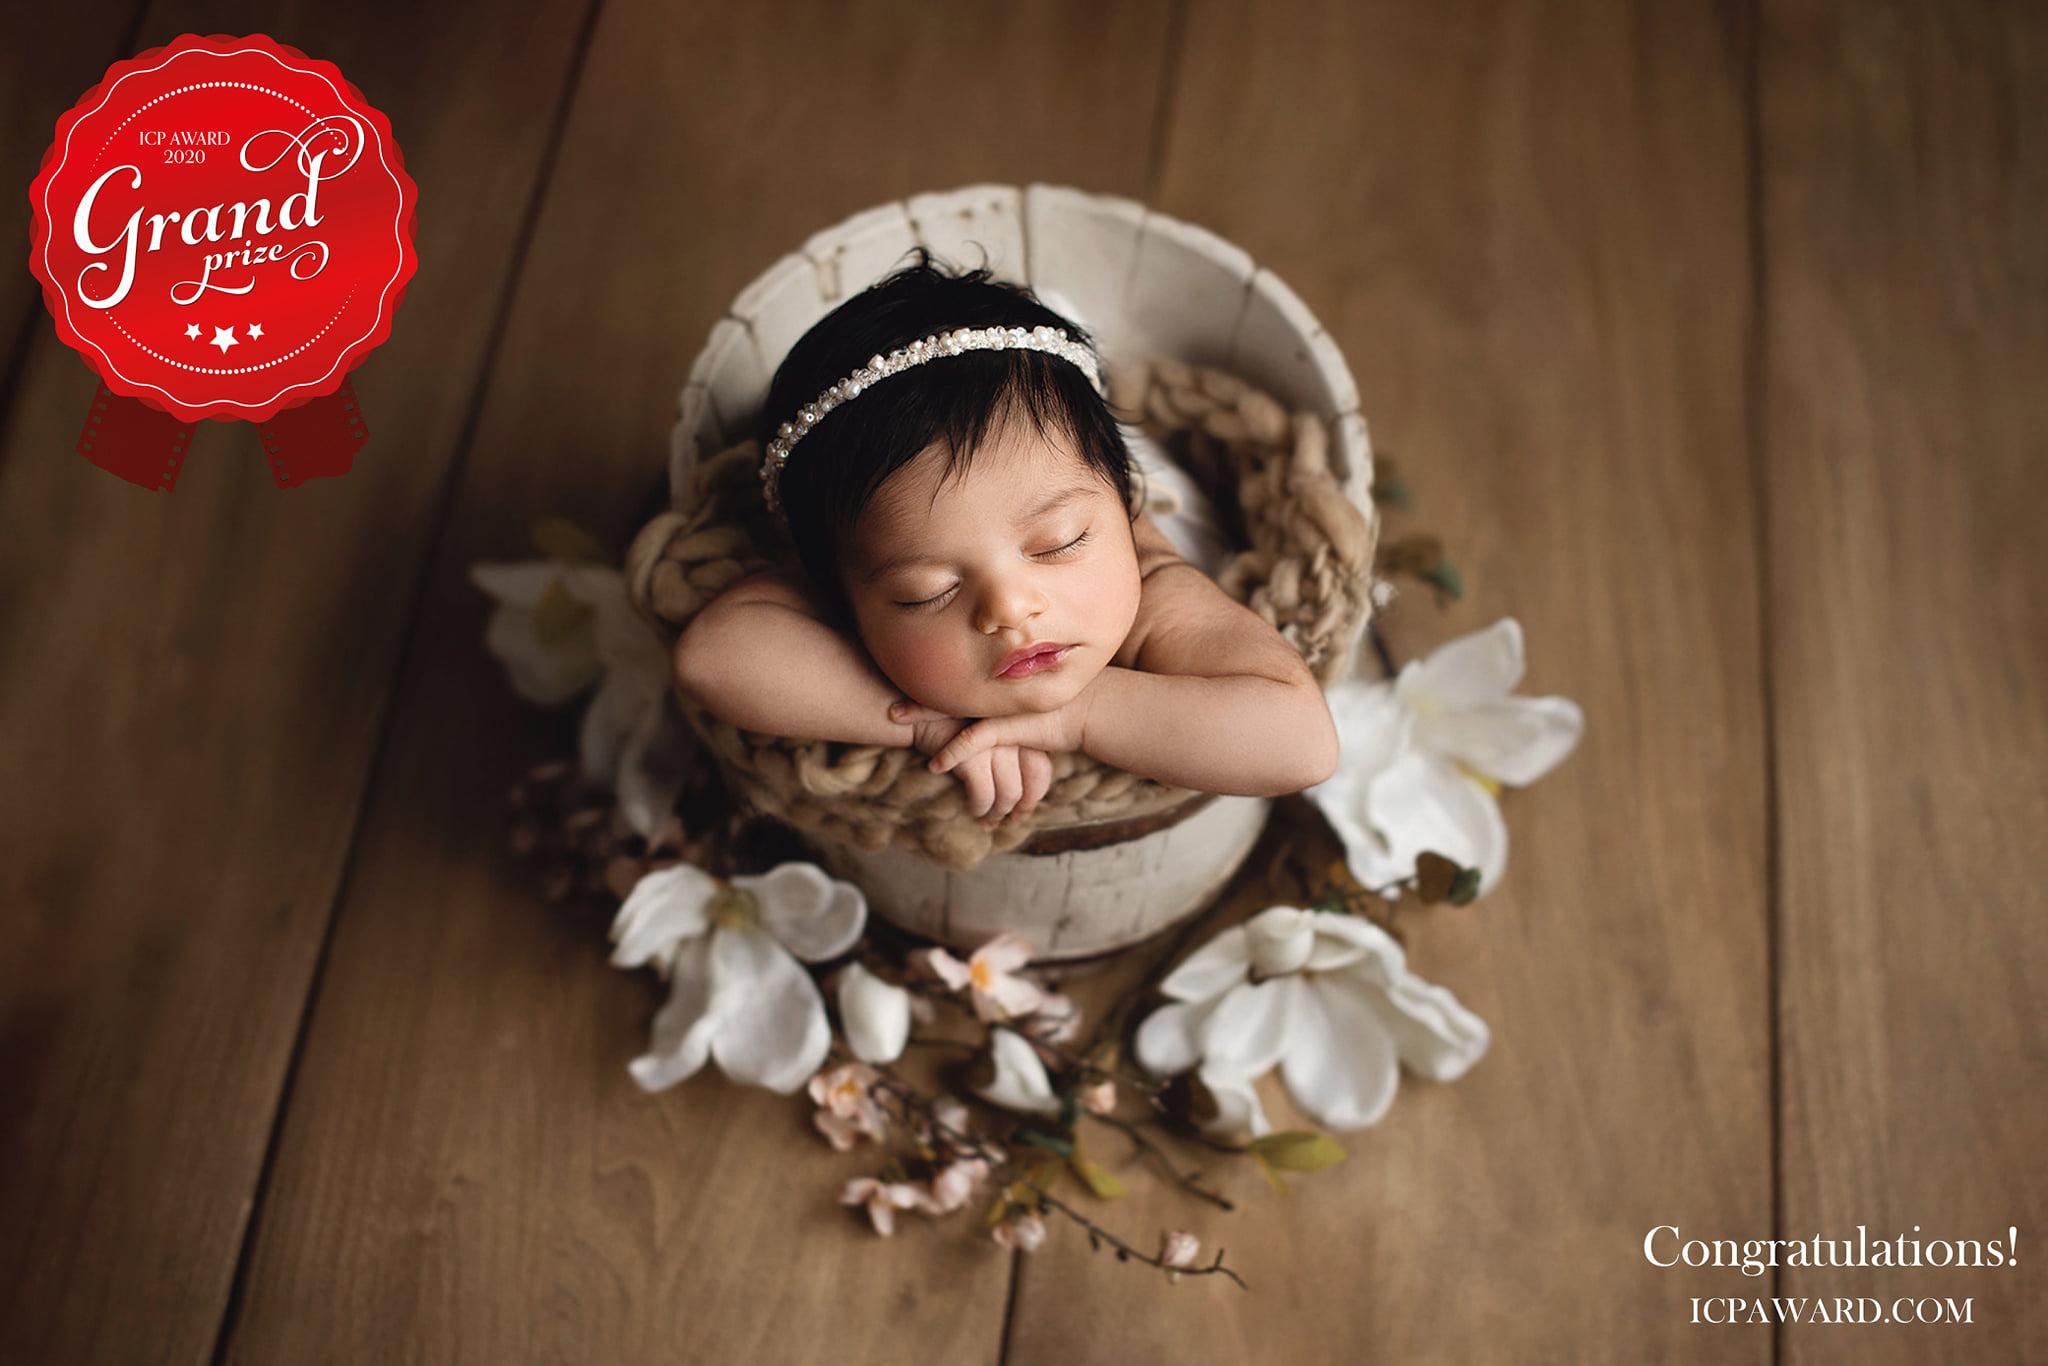 International Child Photographers Awards/GRAND PRIZE